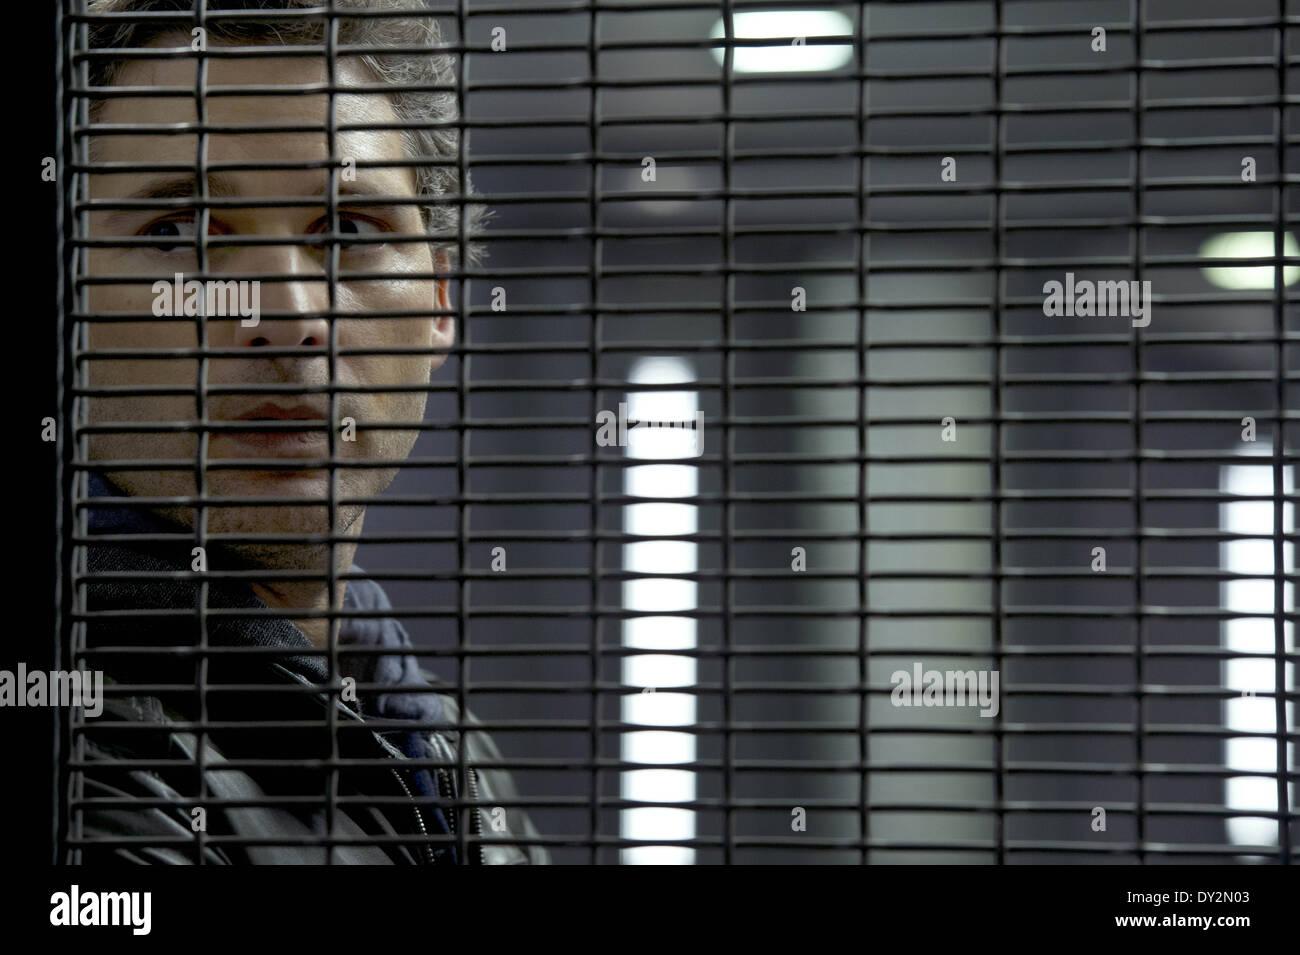 CLOSED CIRCUIT (2013) ERIC BANA JOHN CROWLEY (DIR) MOVIESTORE COLLECTION LTD - Stock Image